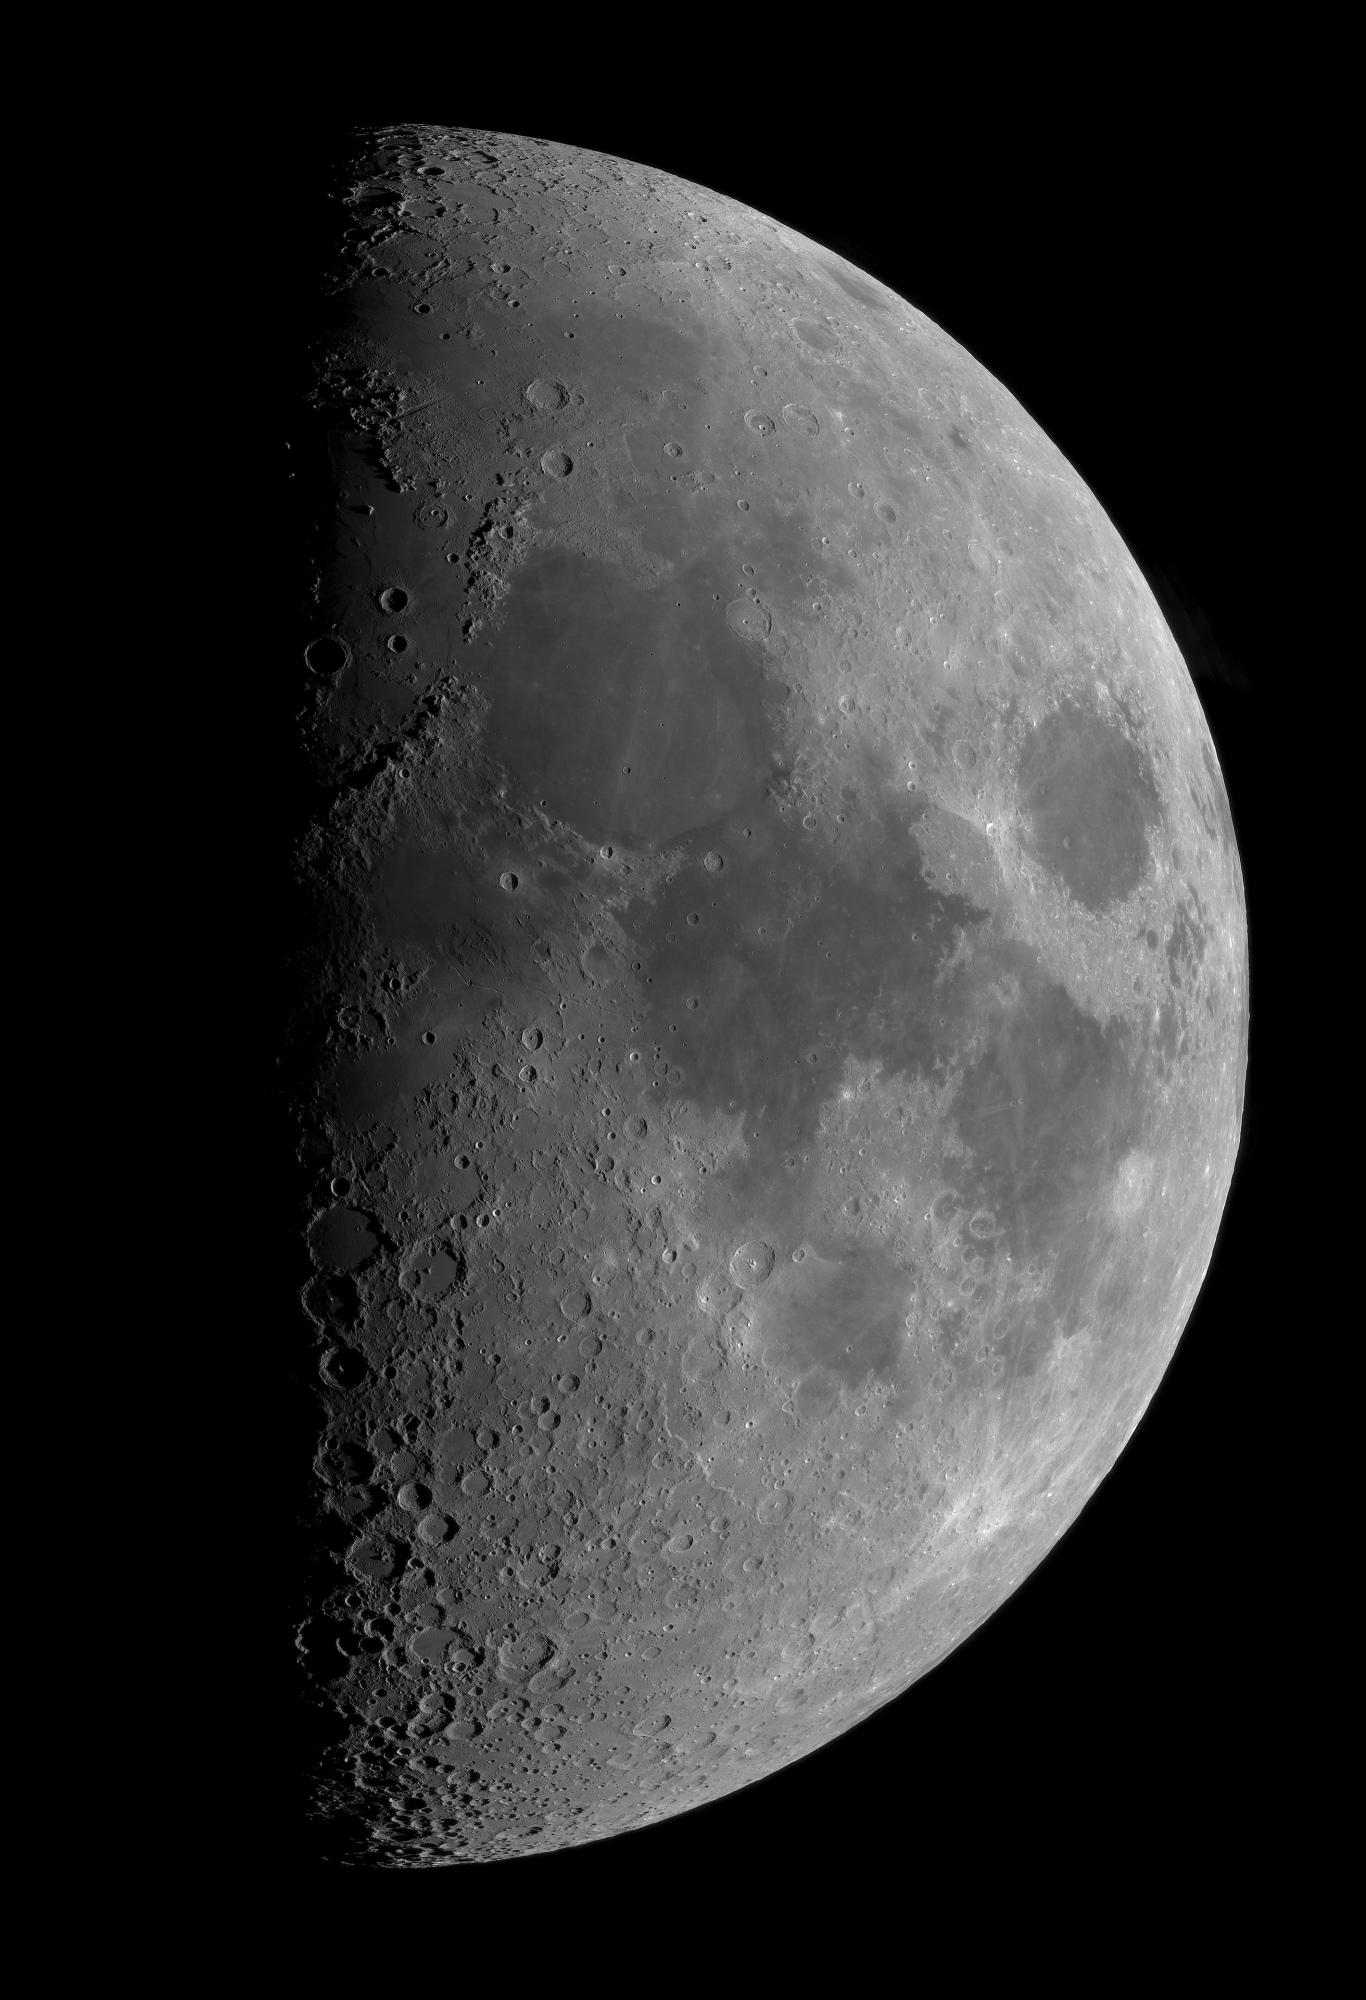 Lune-20191204_PQ_Mosa_fo-PSAS80.jpg